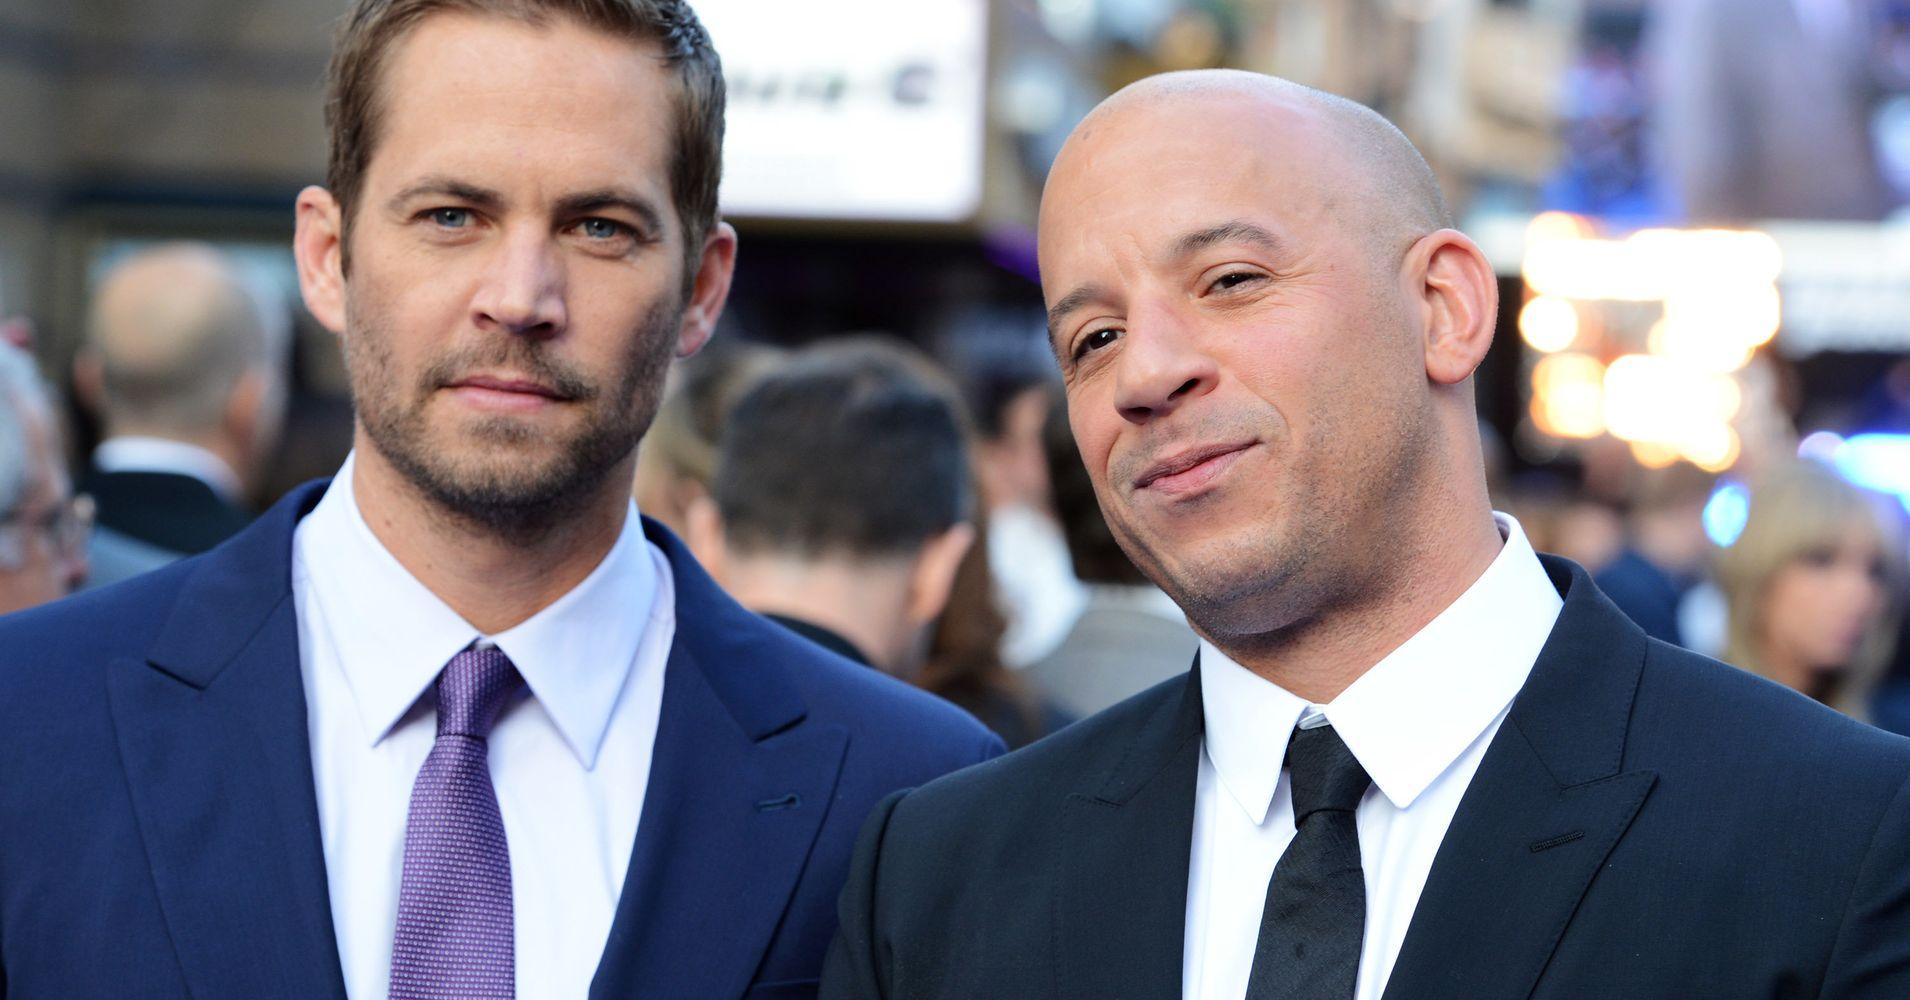 Vin Diesel Shares What Paul Walker's Mother Told Him After ...Vin Diesel Mother Photos